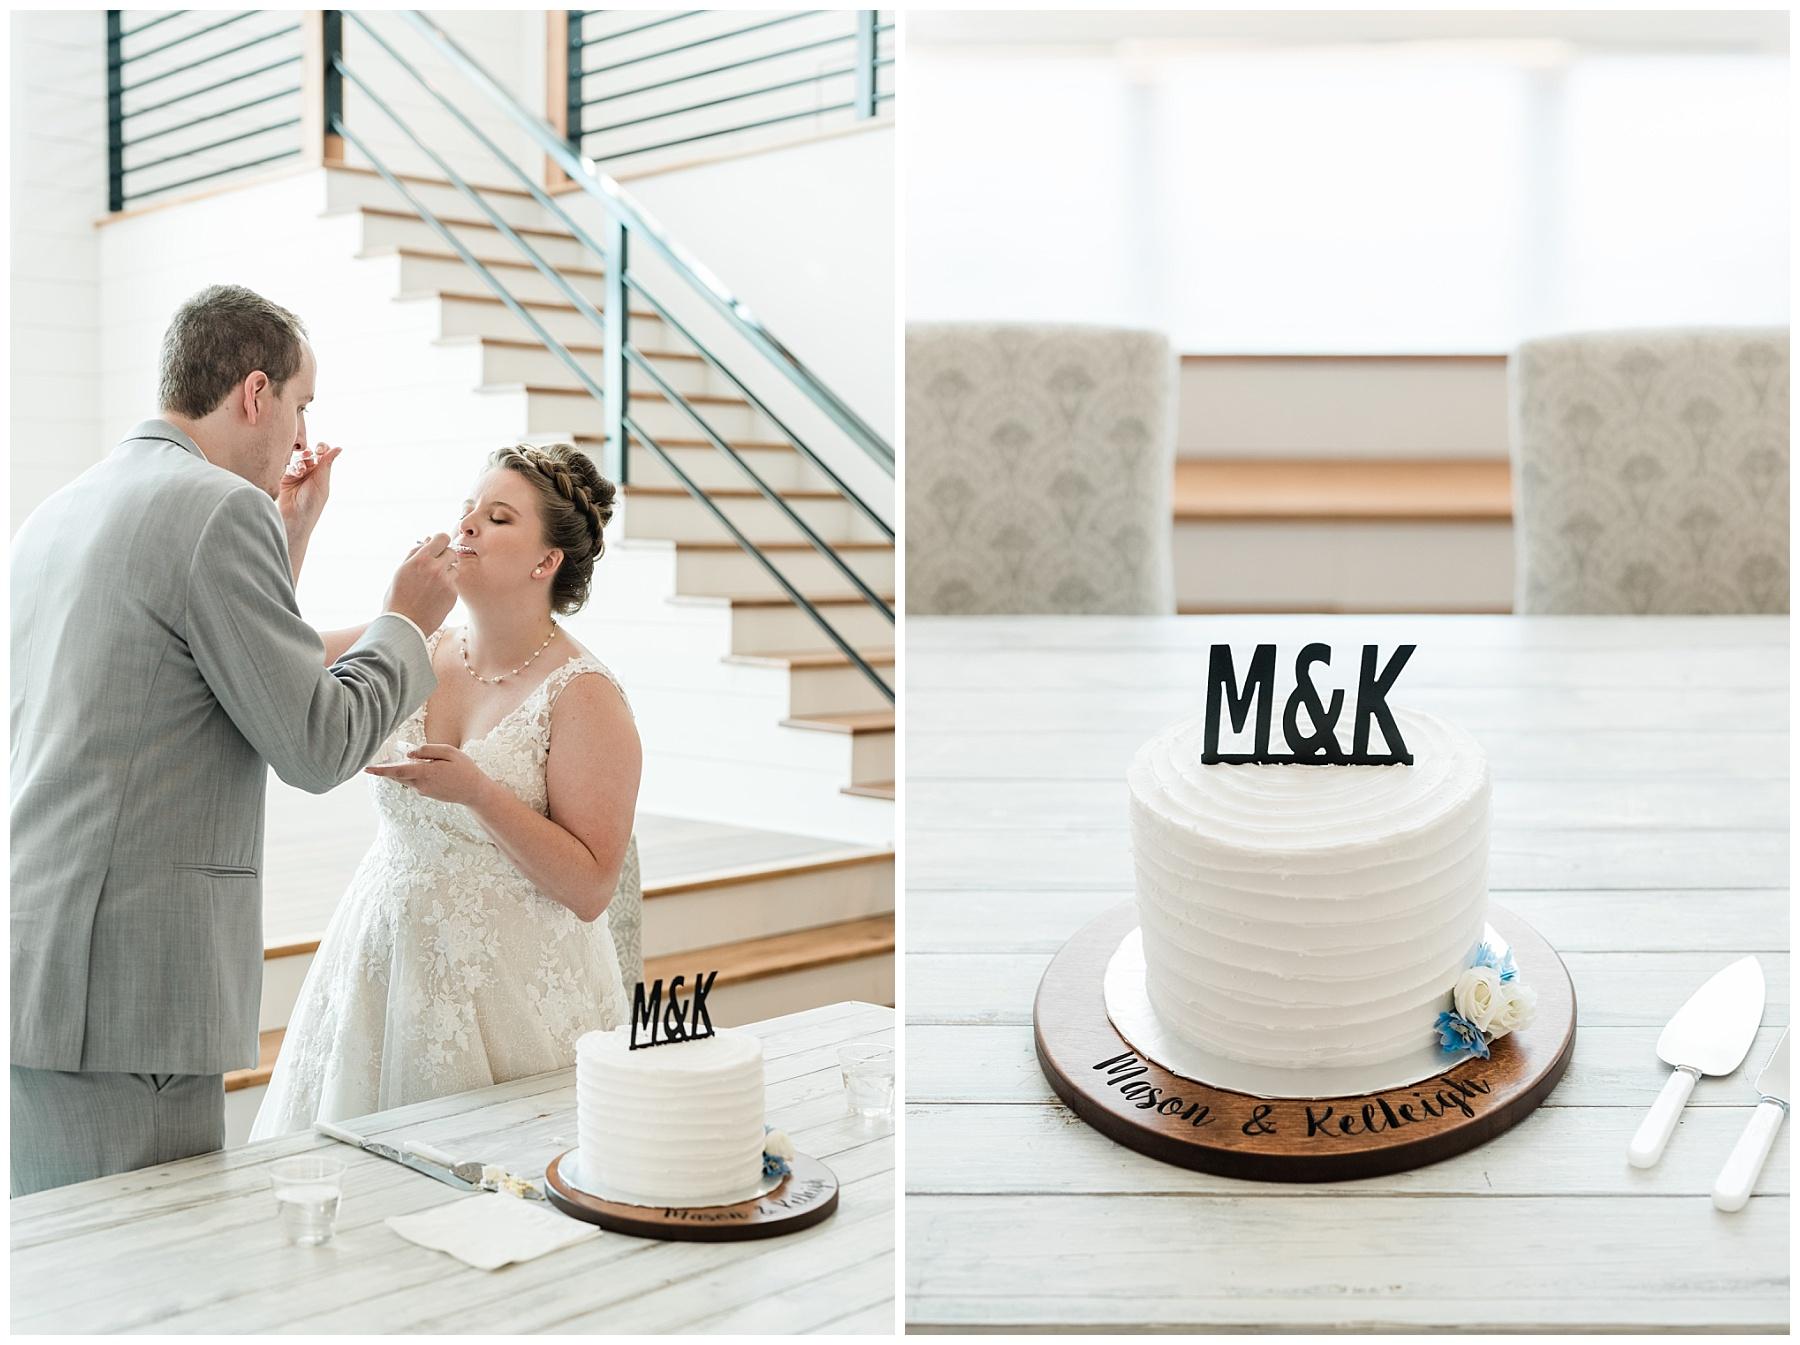 Intimate Summer Wedding at Emerson Fields by Kelsi Kliethermes Photography Best Missouri and Maui Wedding Photographer_0028.jpg